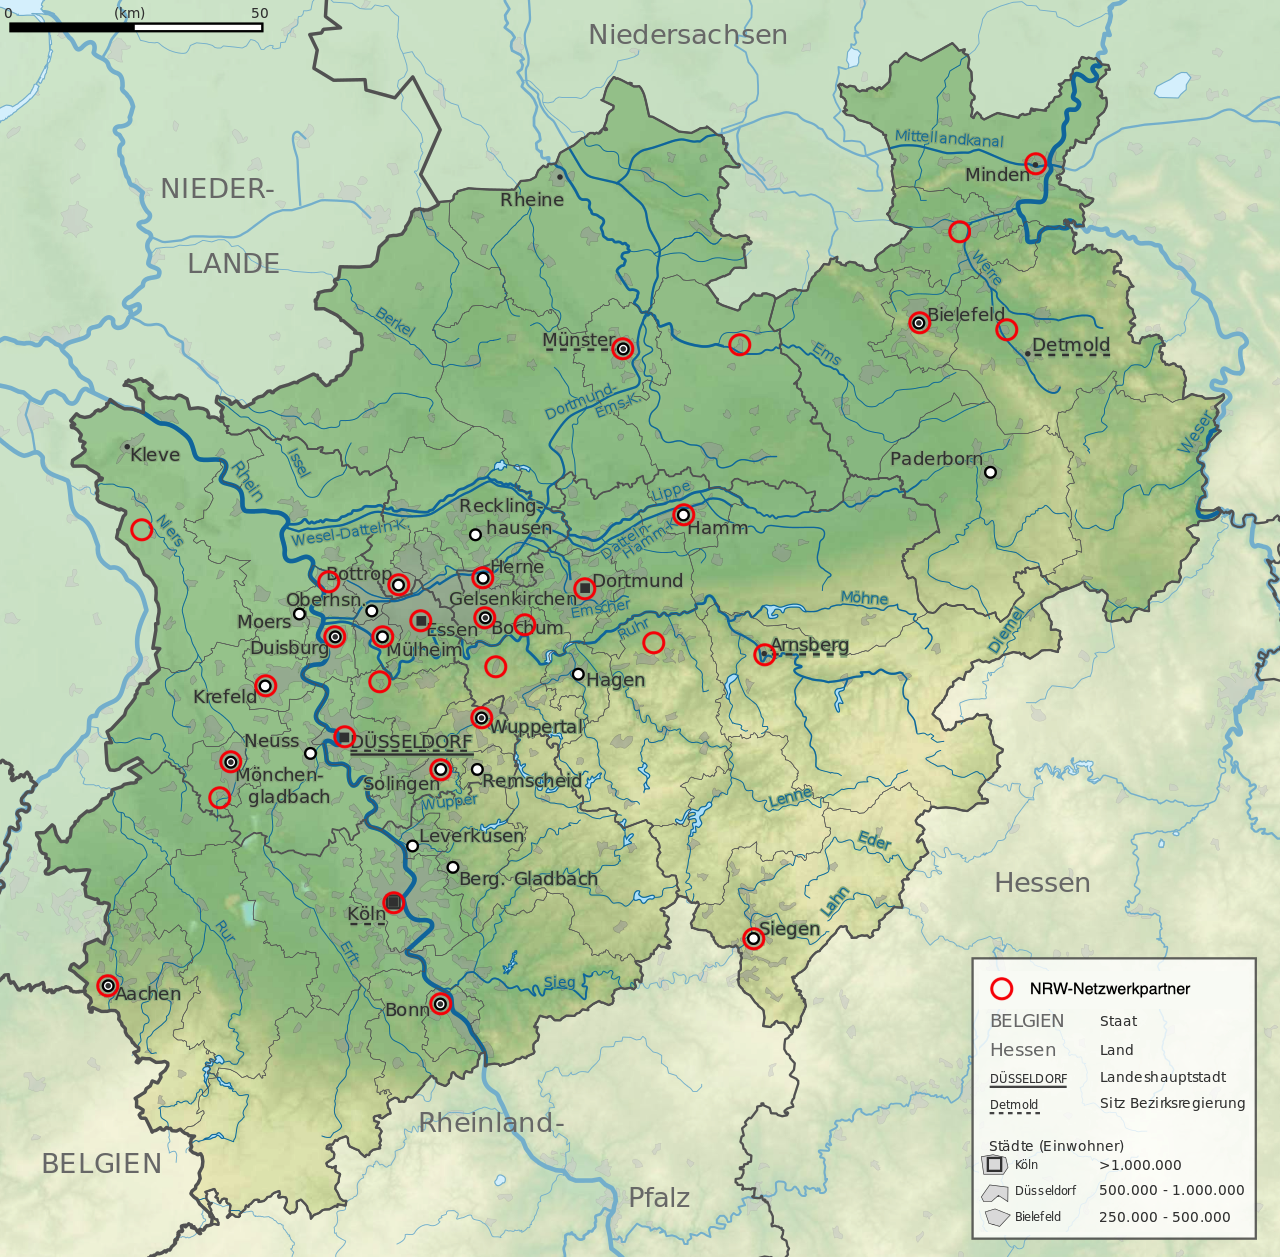 North_Rhine-Westphalia_Netzwerkpartner